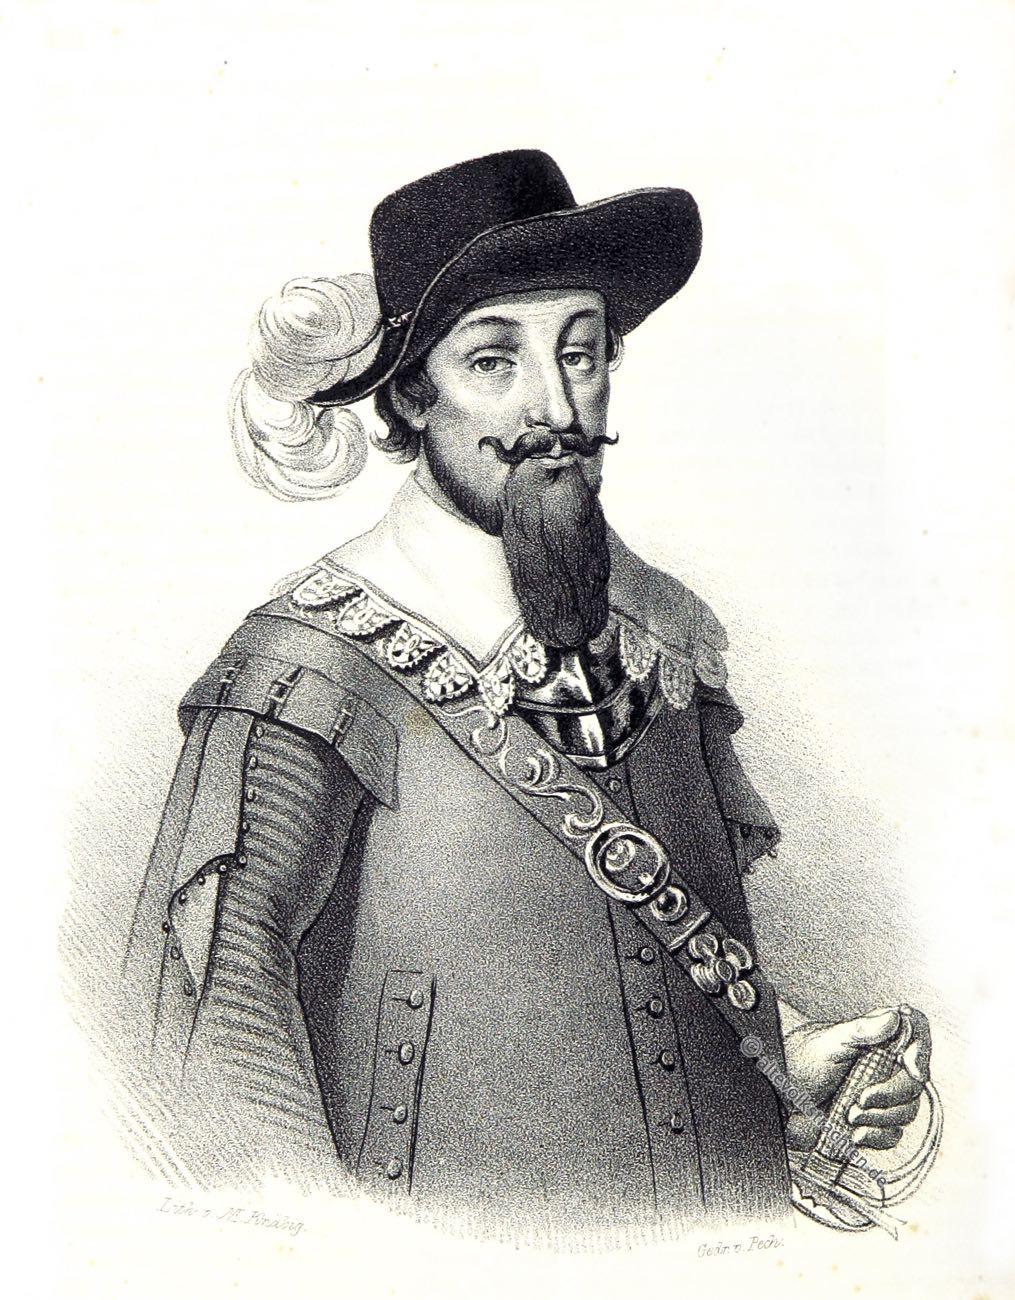 Hans Georg von Arnim-Boitzenburg, Dreißigjähriger Krieg, Feldmarschall, Feldherr, Uniform, Barock, Generalfeldmarschall